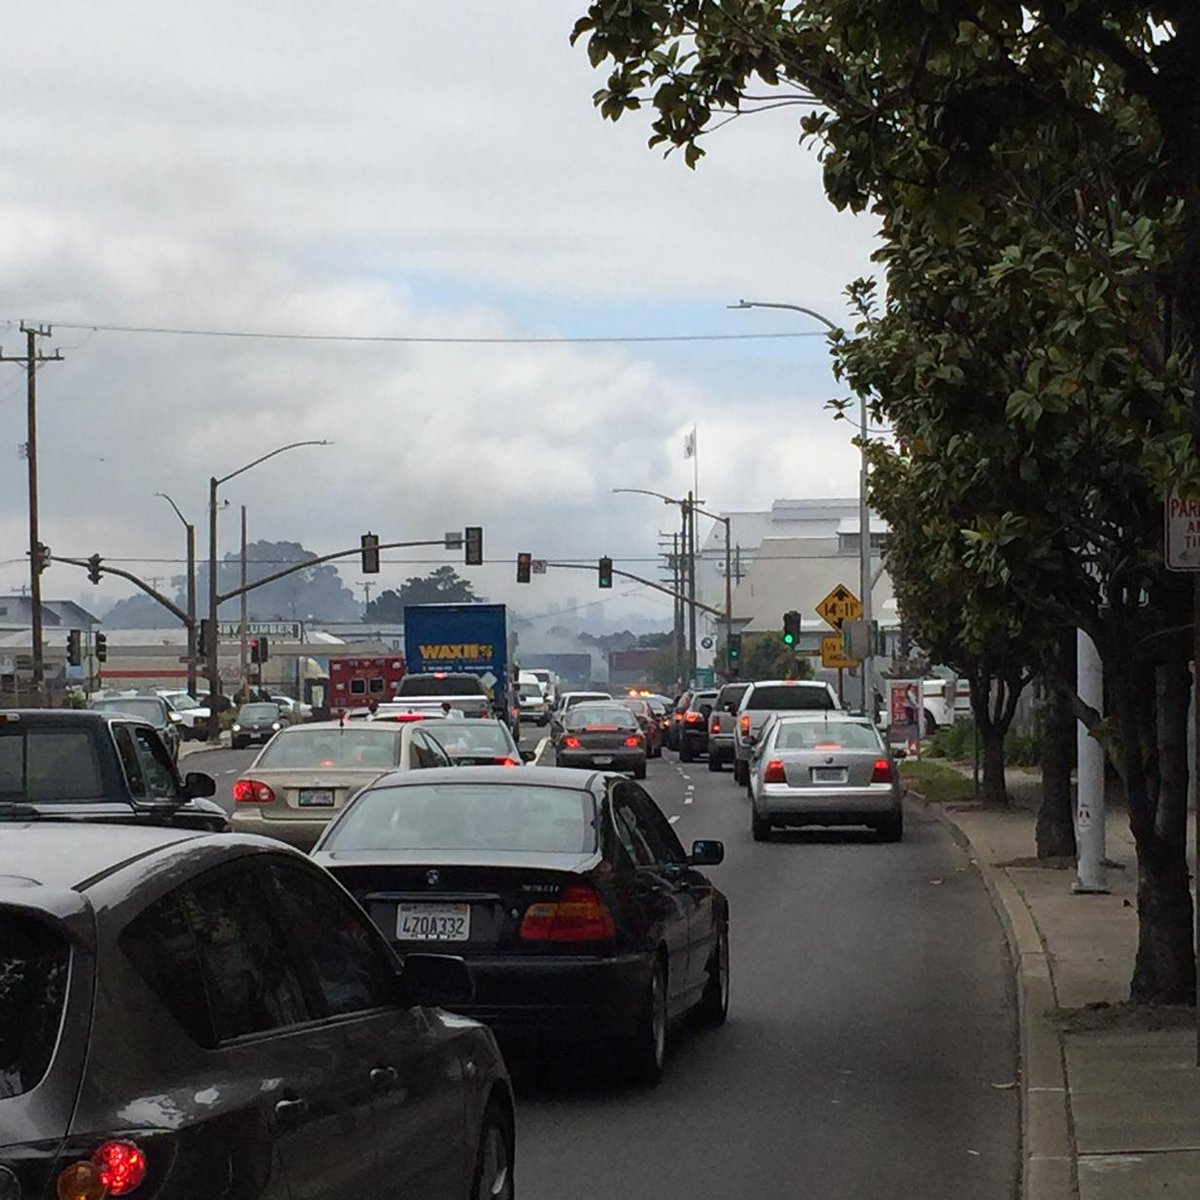 Big fire on Ashby just west of 9th St.  Ashby shut down. /cc @berkeleyside http://t.co/tD5OkPTdbT